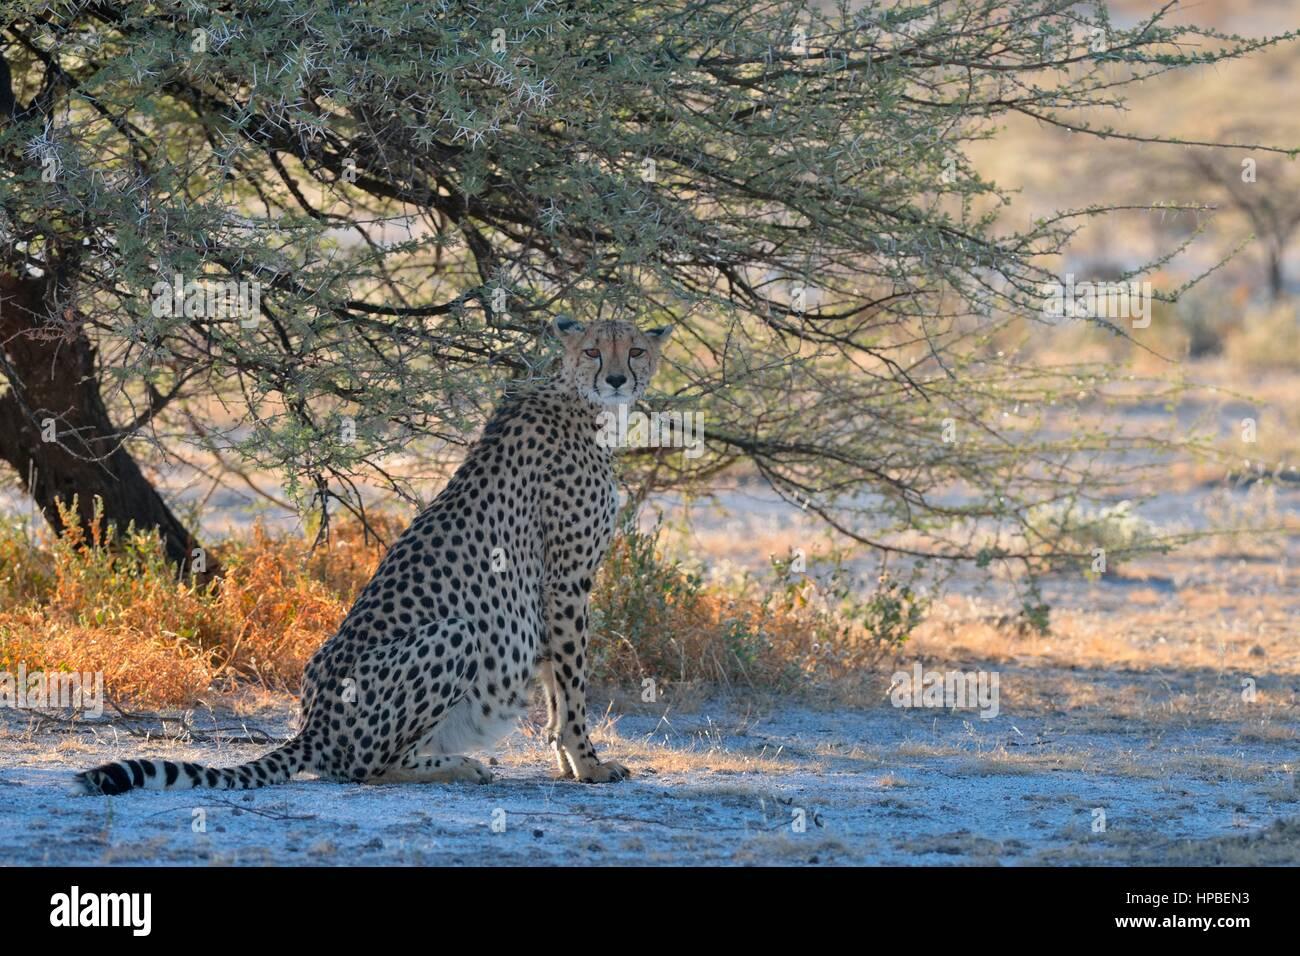 Cheetah (Acinonyx jubatus), female, sitting in the shade of a tree, attentive, Etosha National Park, Namibia, Africa - Stock Image